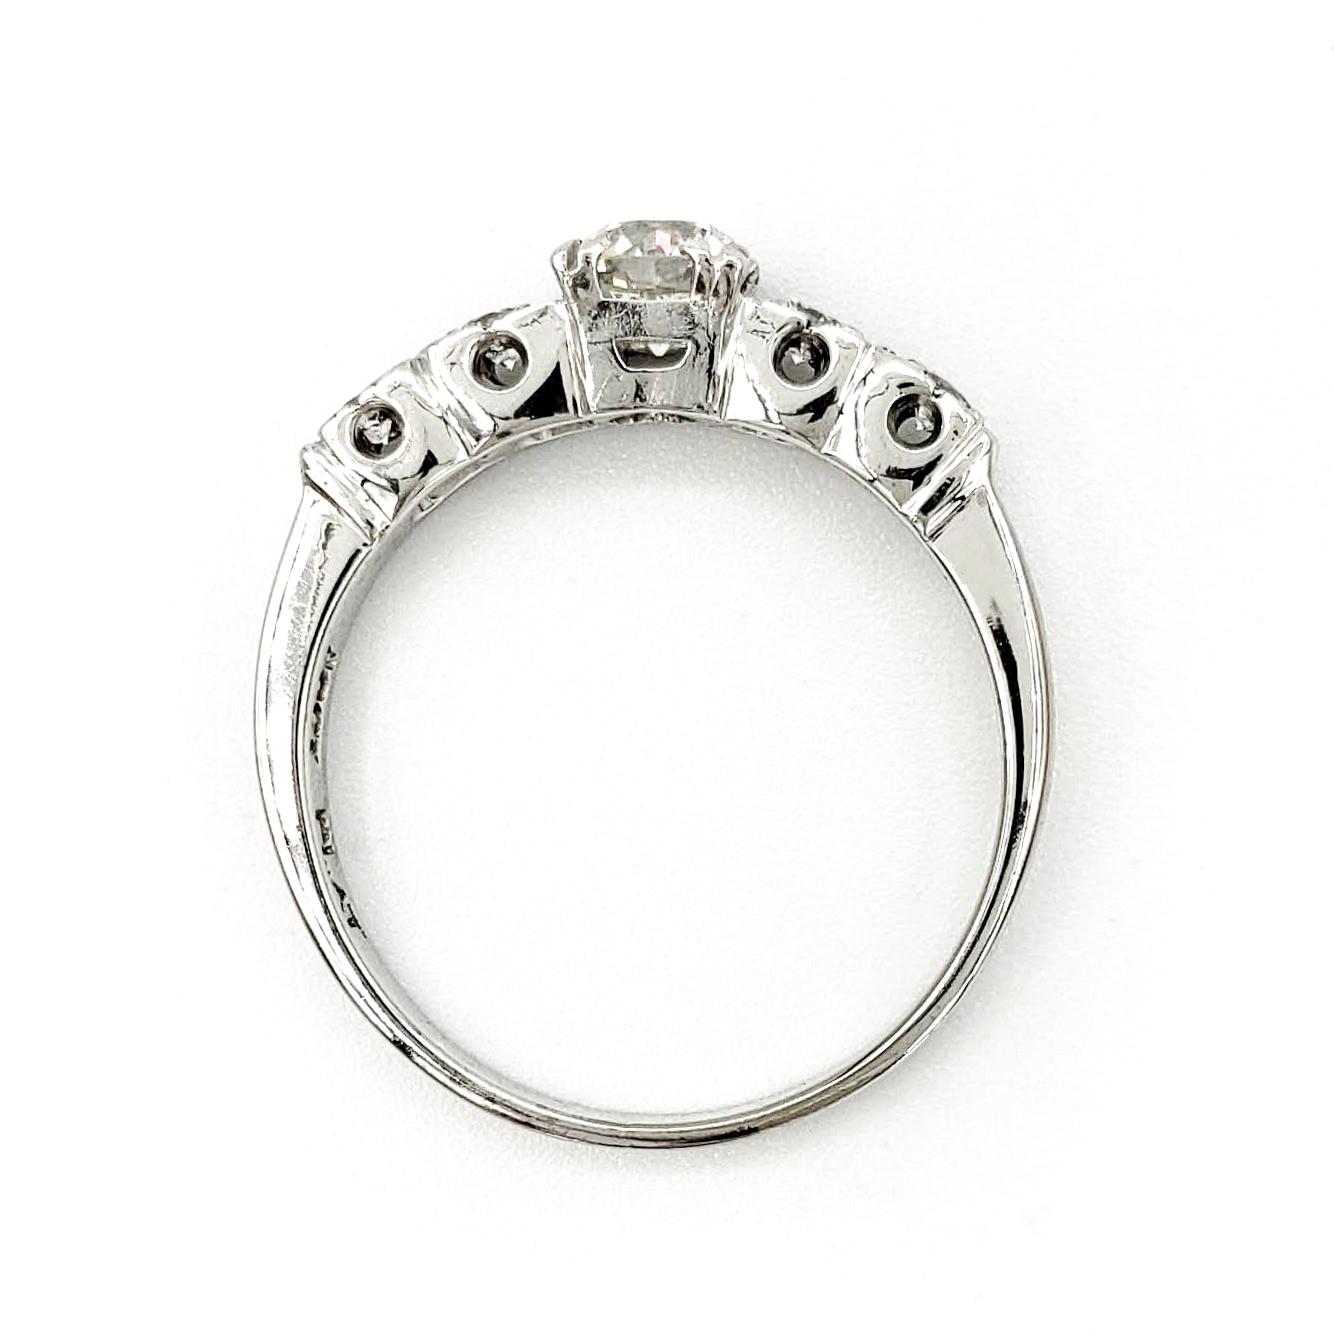 vintage-platinum-engagement-ring-with-0-52-carat-old-european-cut-diamond-egl-h-vs1